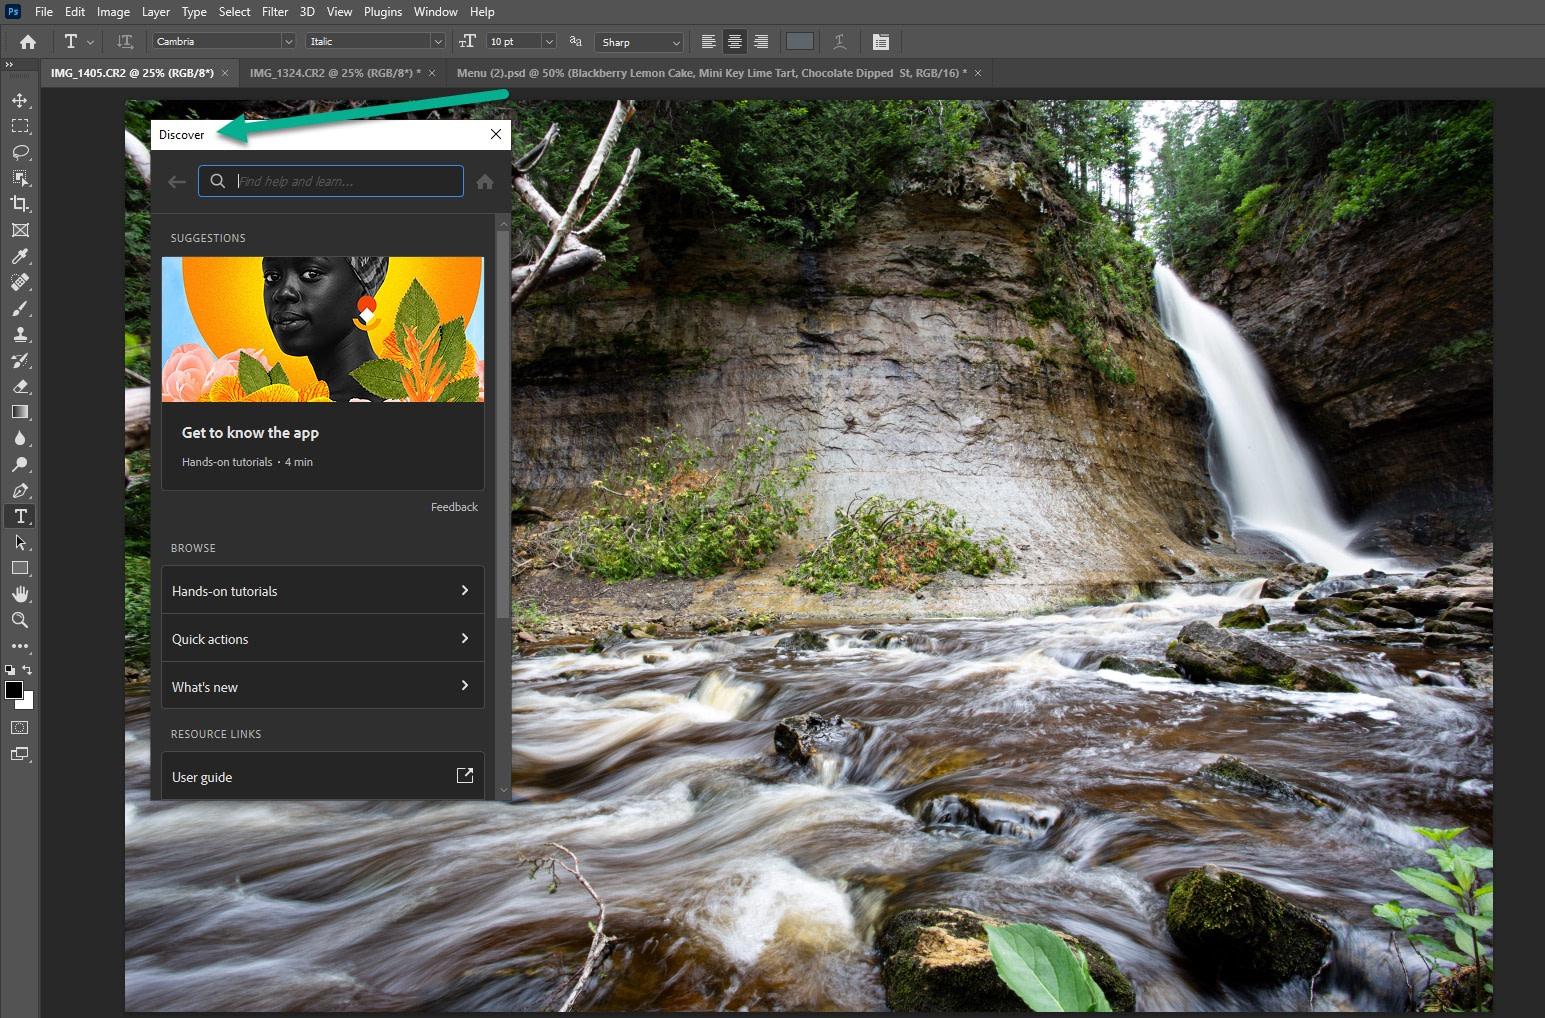 discovery - Photoshop vs Illustrator vs InDesign